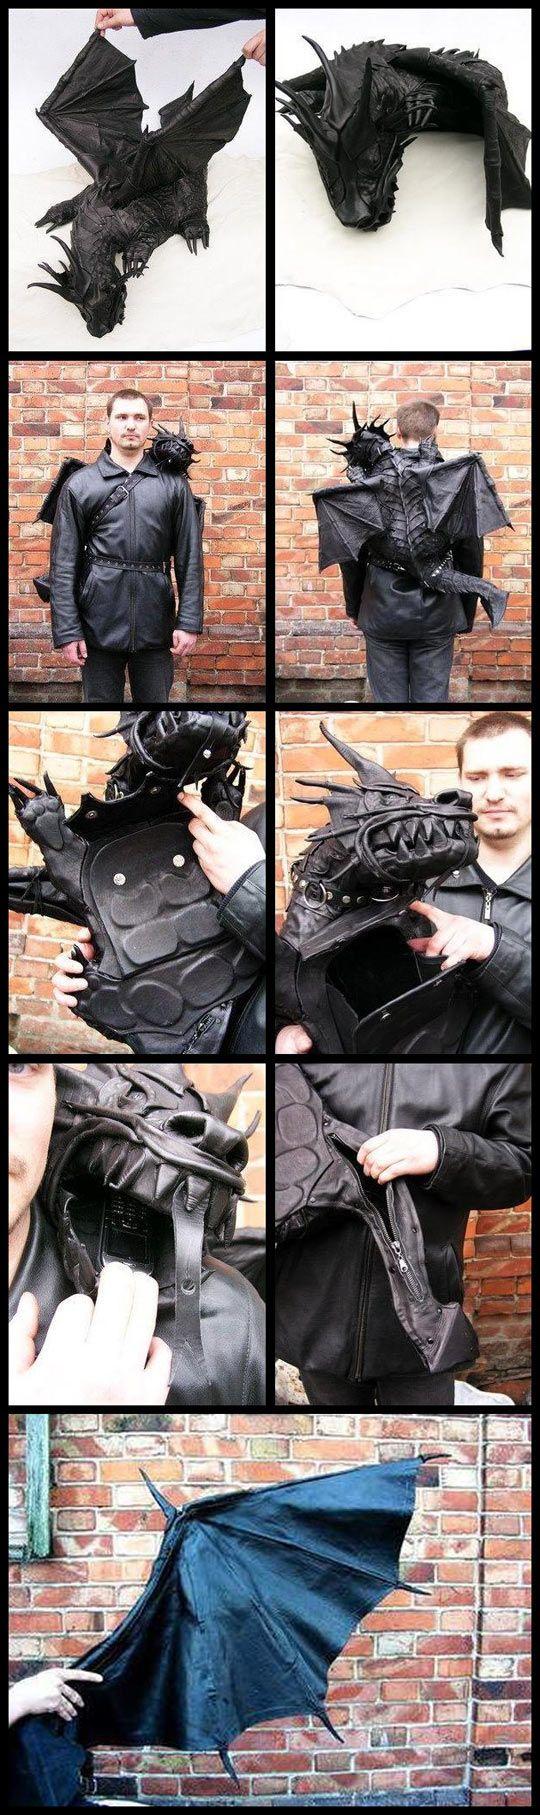 cool-dragon-bag-black. That is pretty cool.